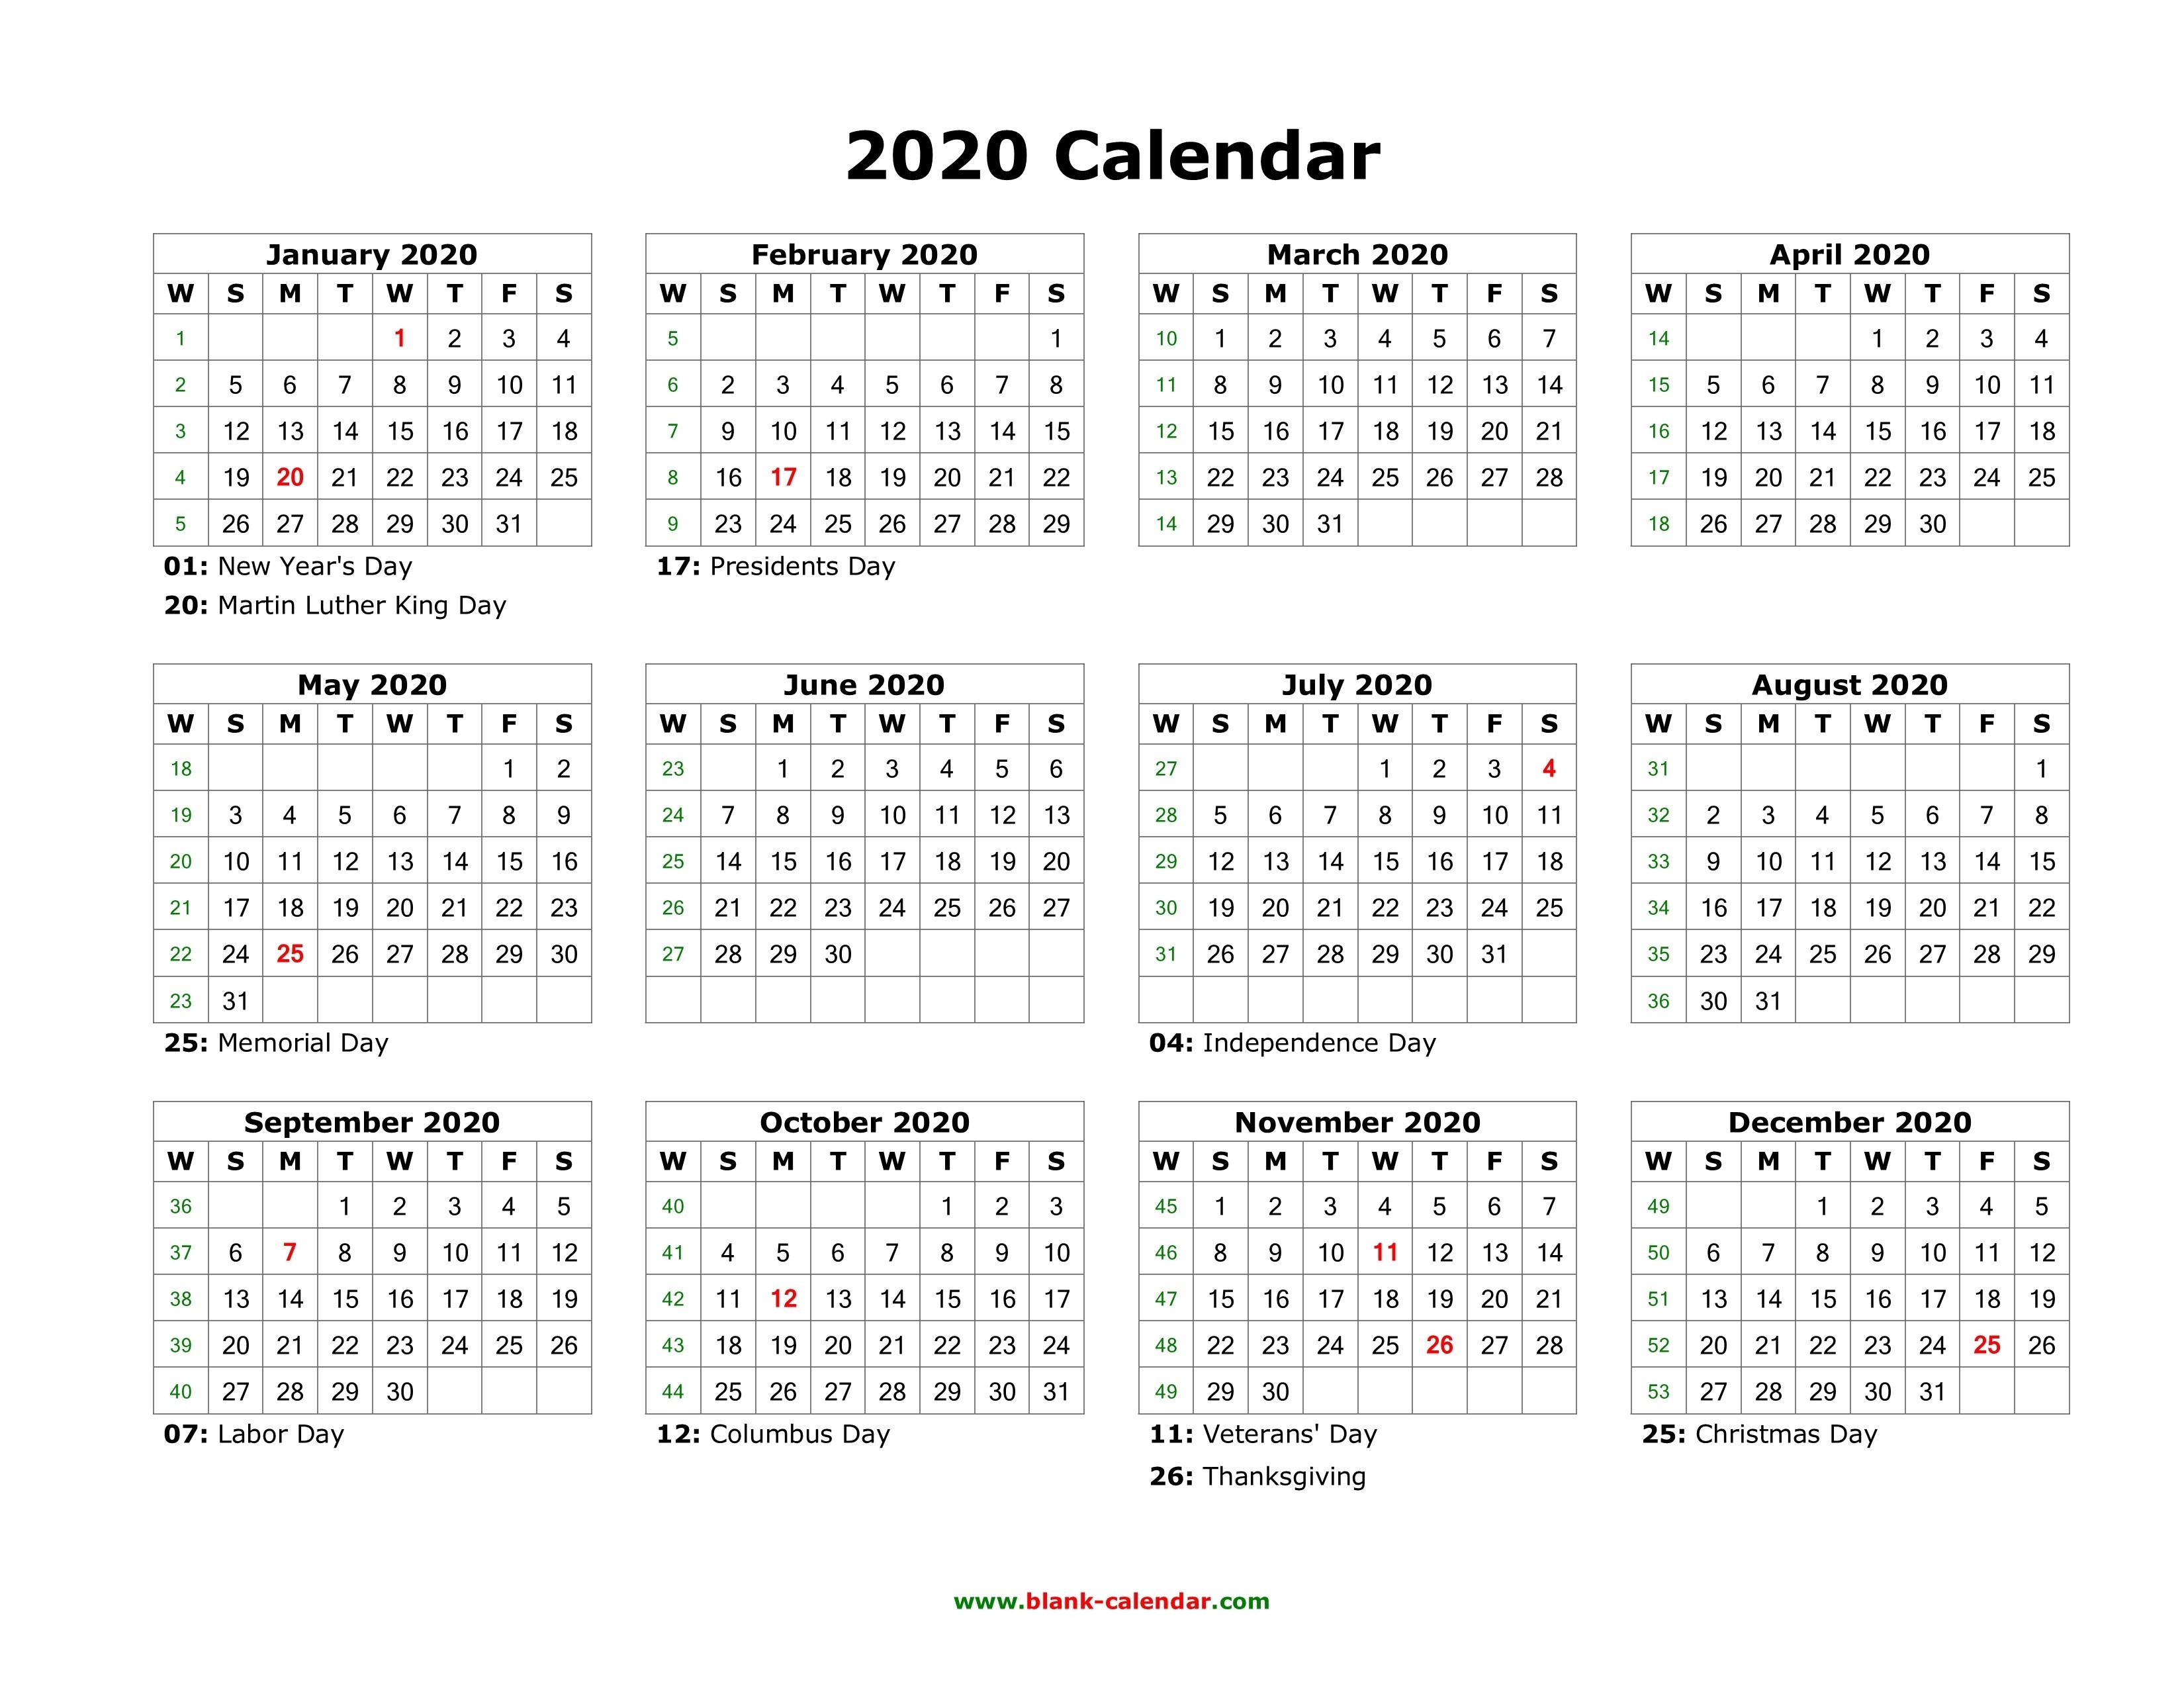 Blank Calendar 2020 | Free Download Calendar Templates-2020 Fill In Printable Monthly Calendar